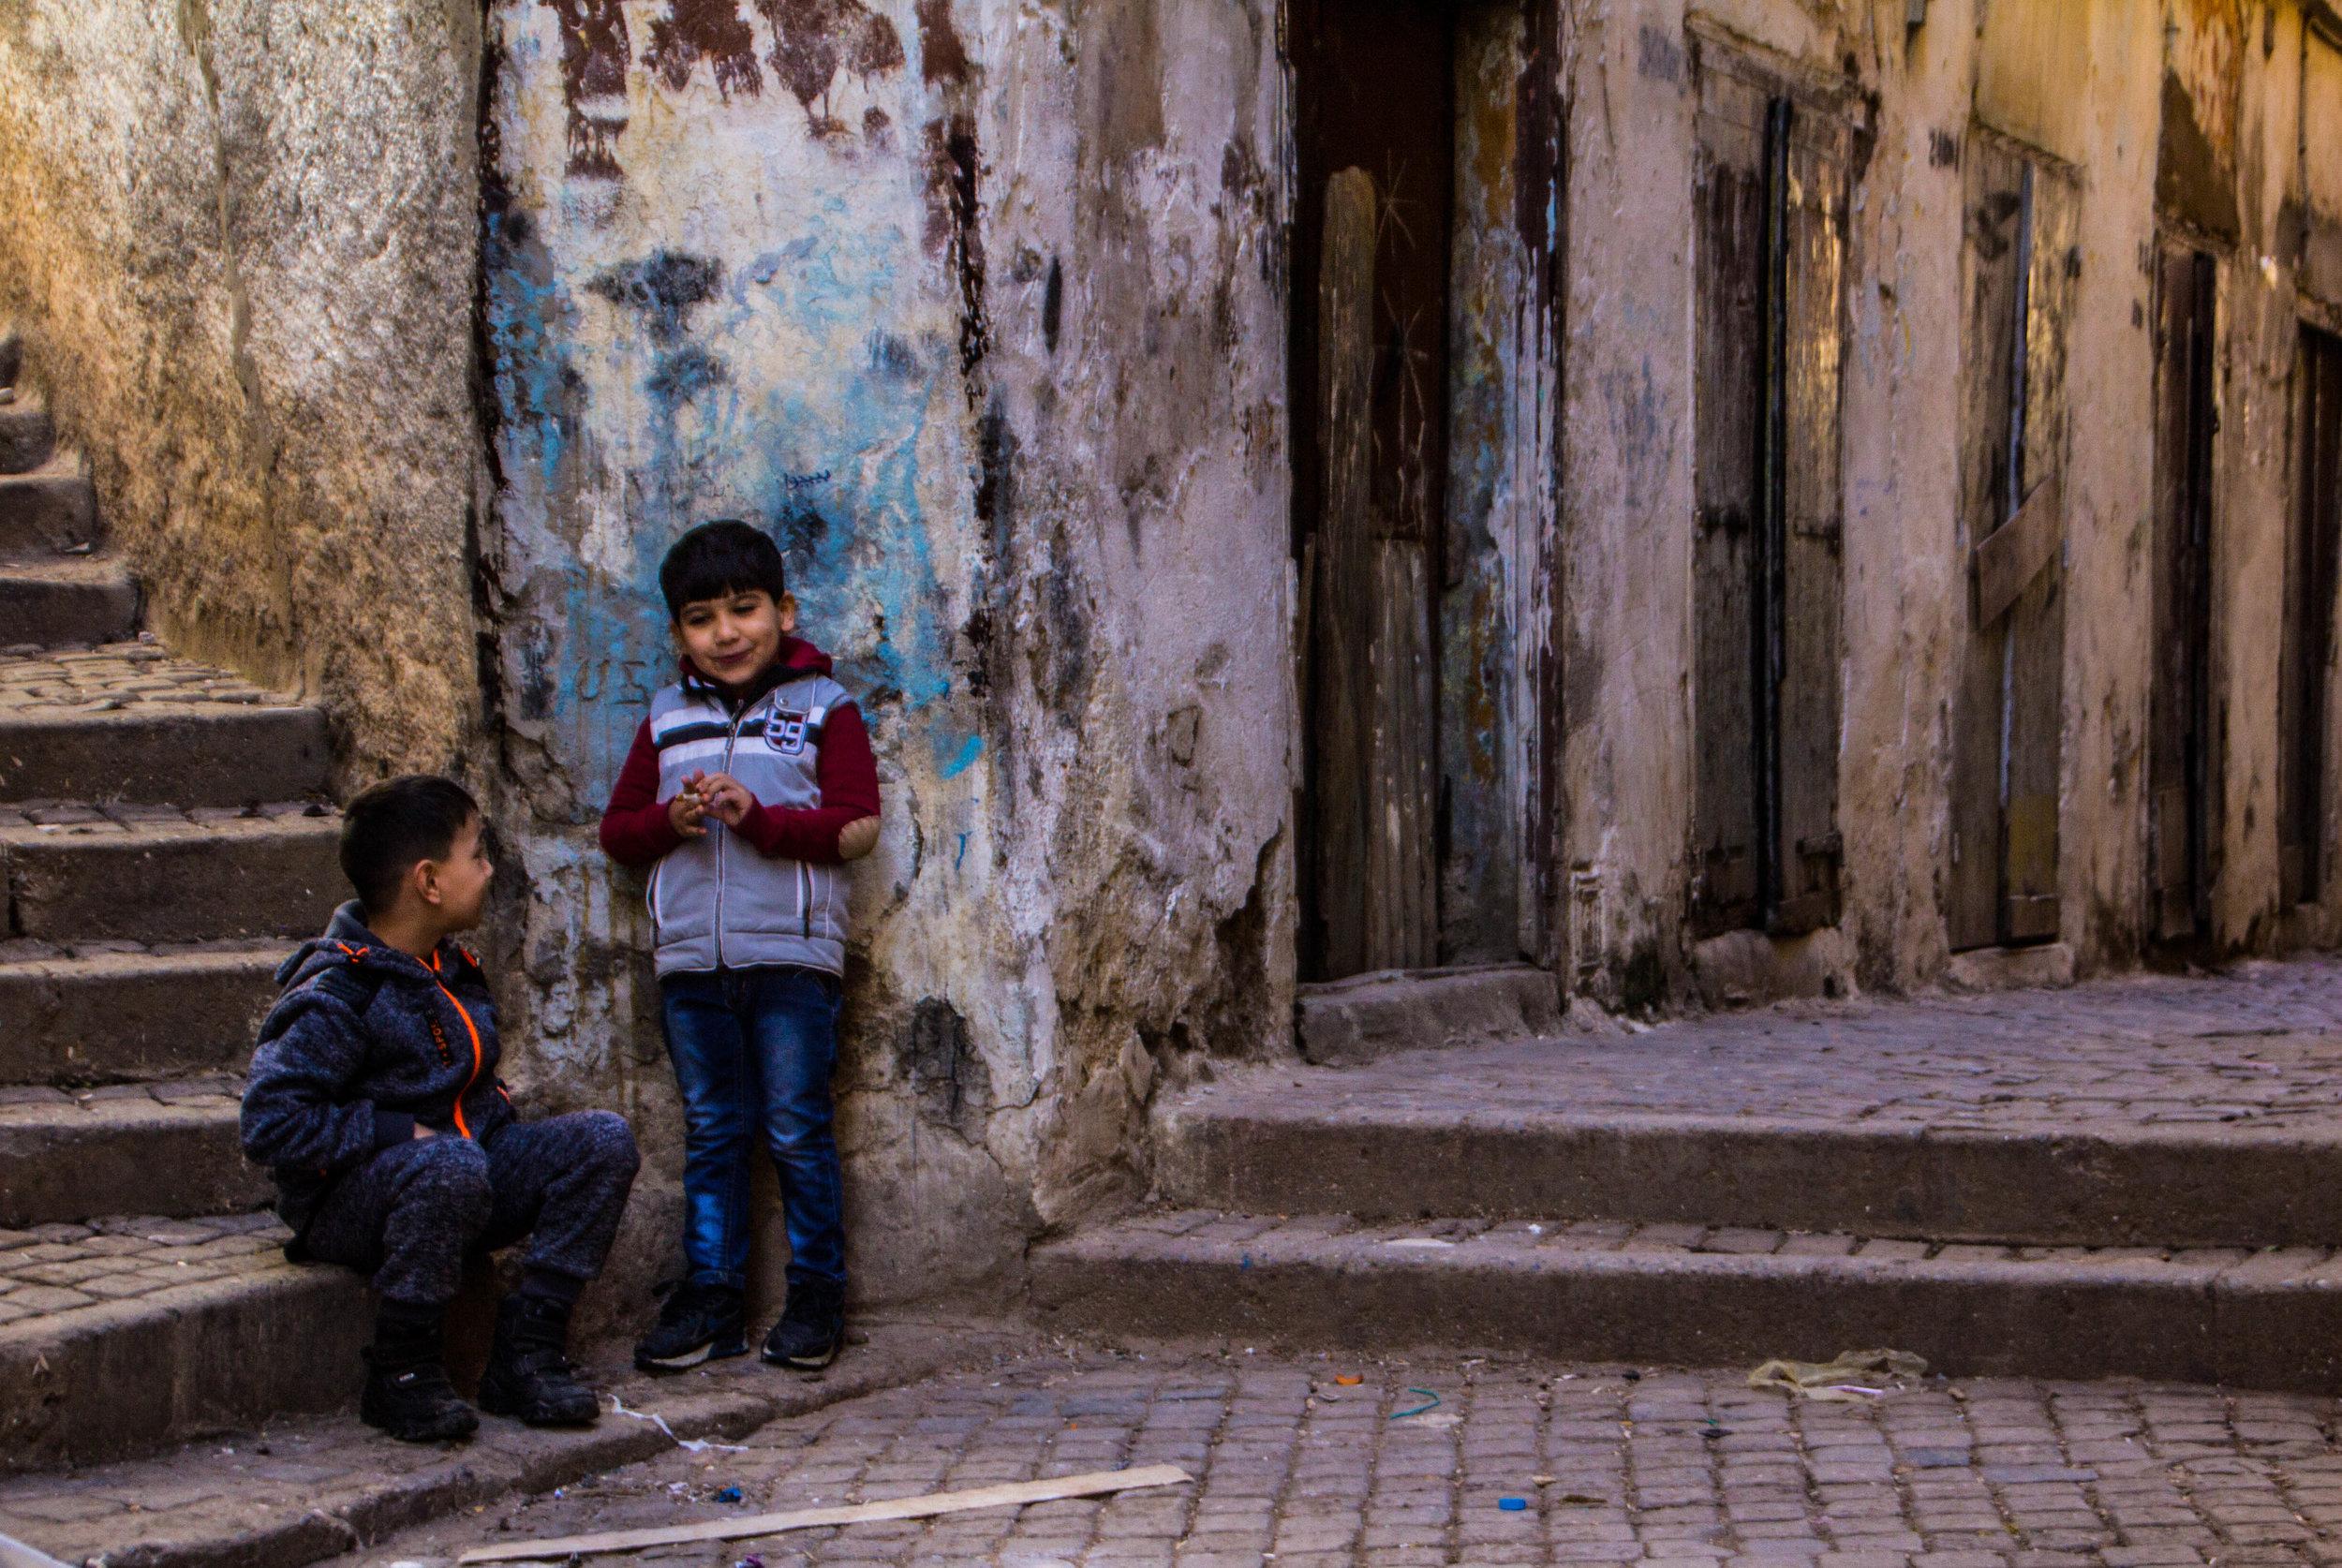 casbah-photography-algiers-algeria-alger-23.jpg